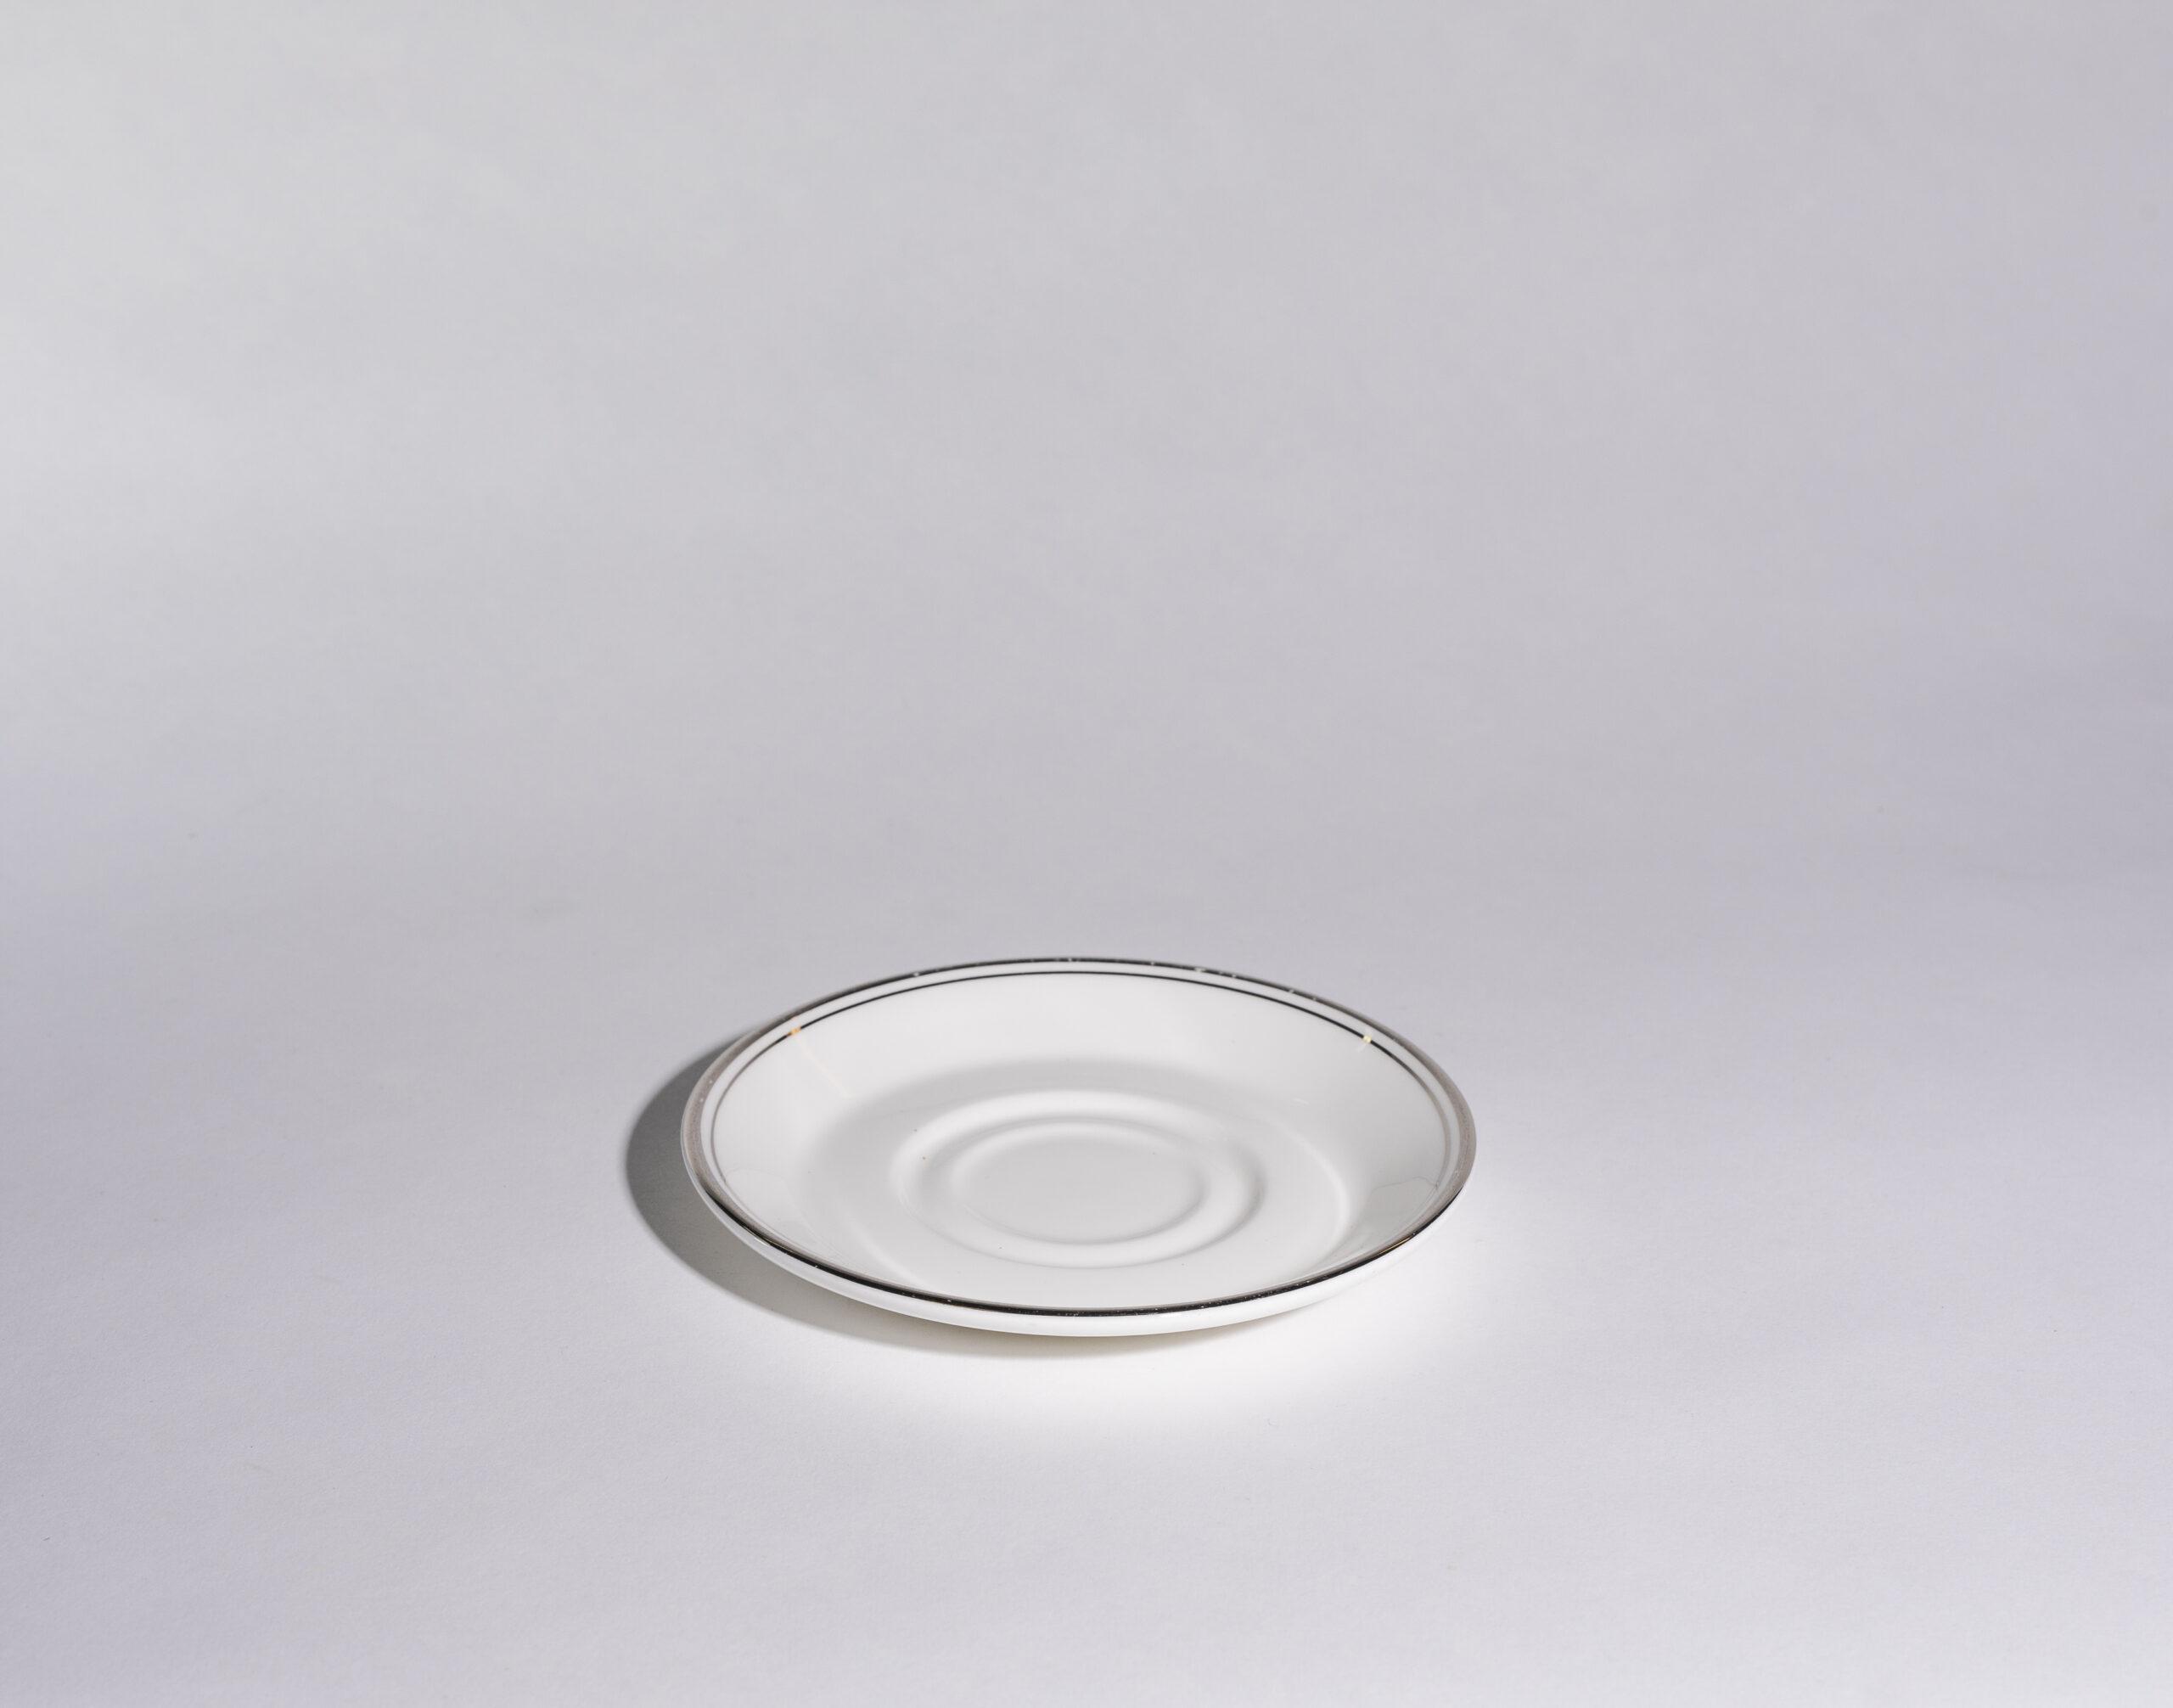 Coffee cup saucers